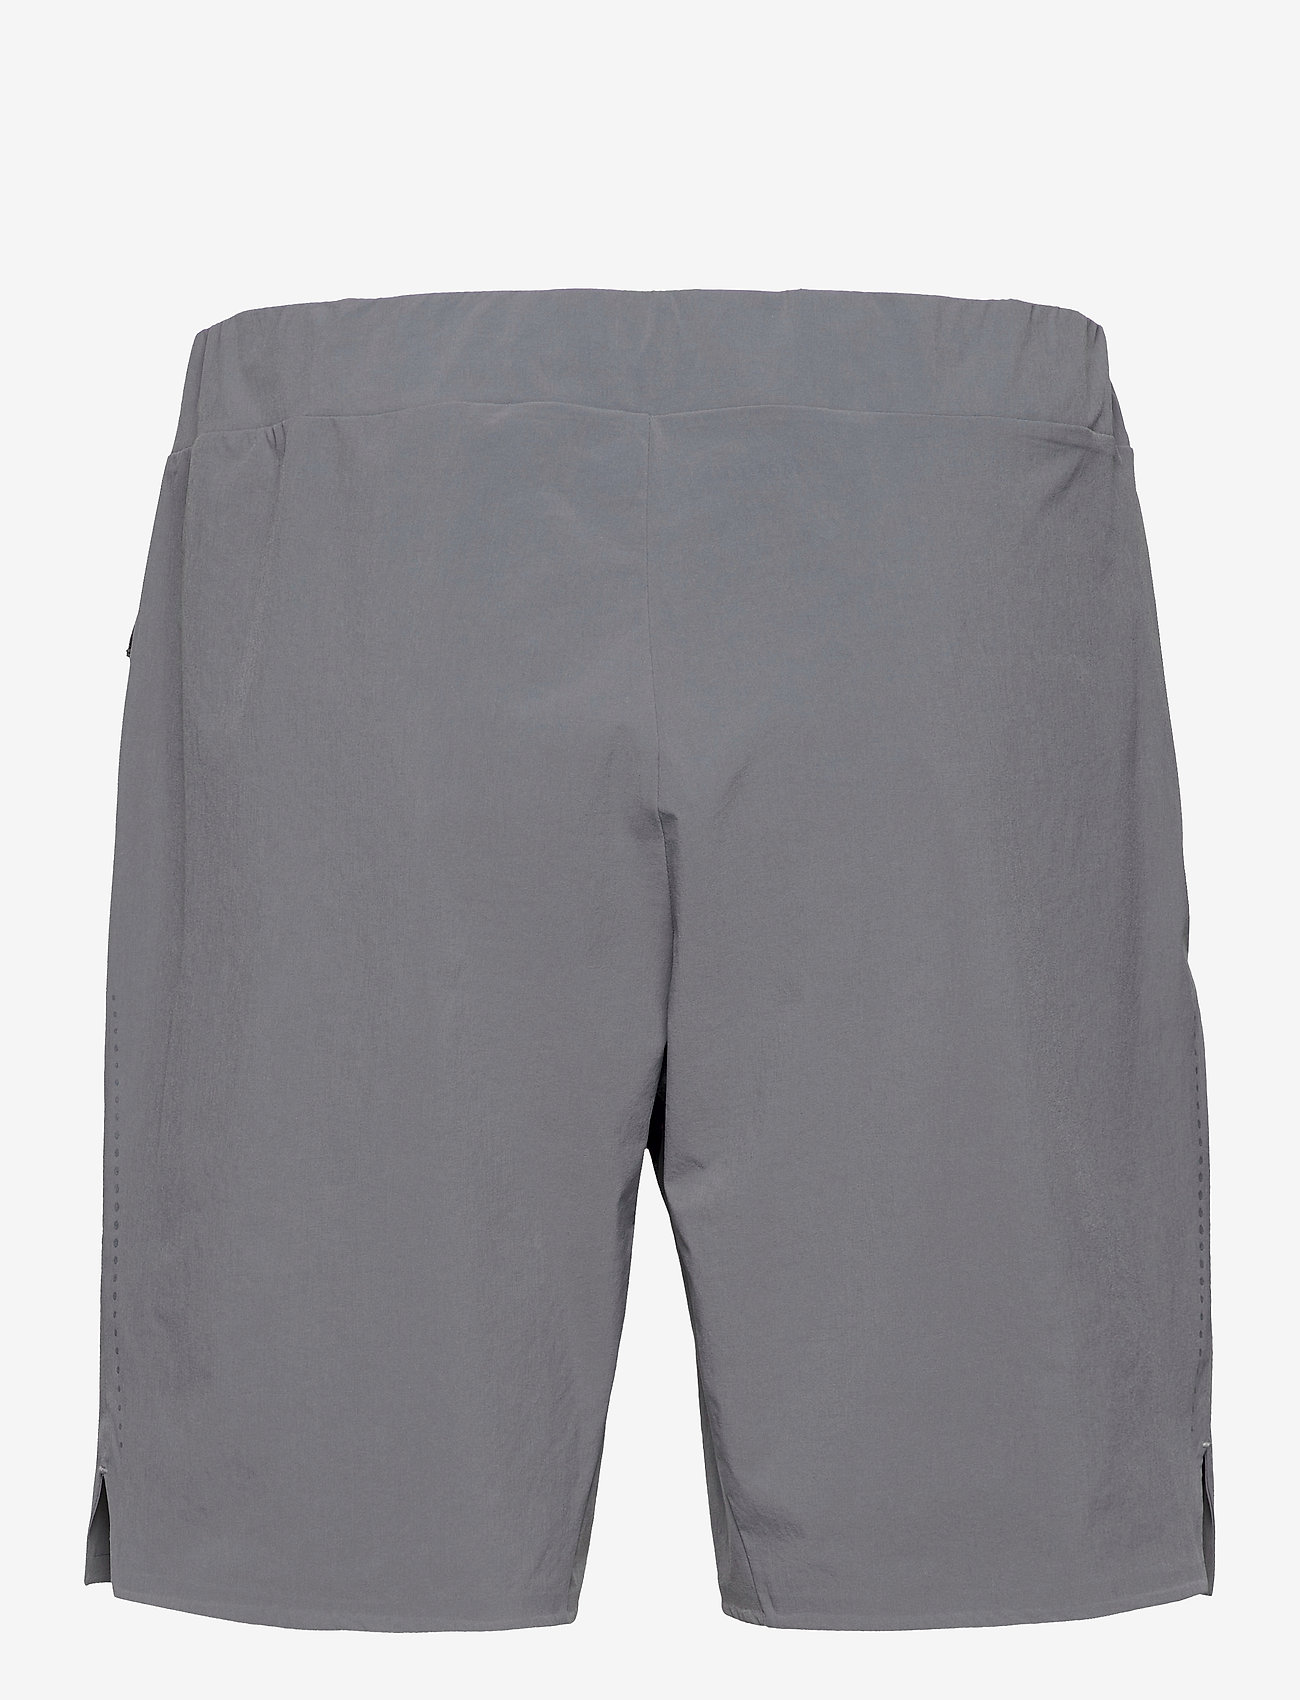 Bergans - Flyen V2 Shorts - wandel korte broek - solid dark grey - 1